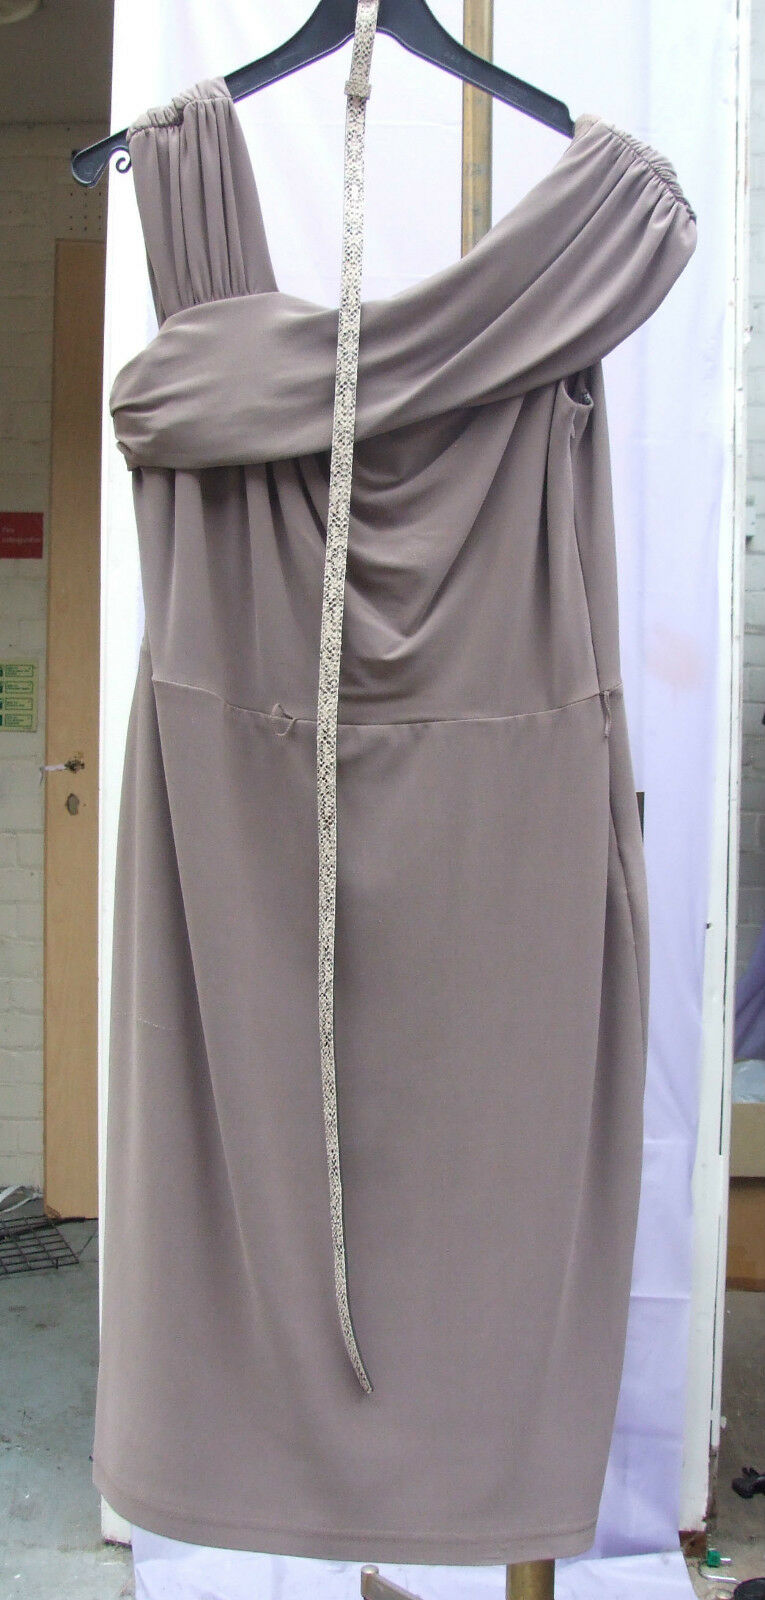 Joseph Ribkoff BNWT 14 Magnificent Taupe Asymmetric Shoulder Dress & Belt US 12